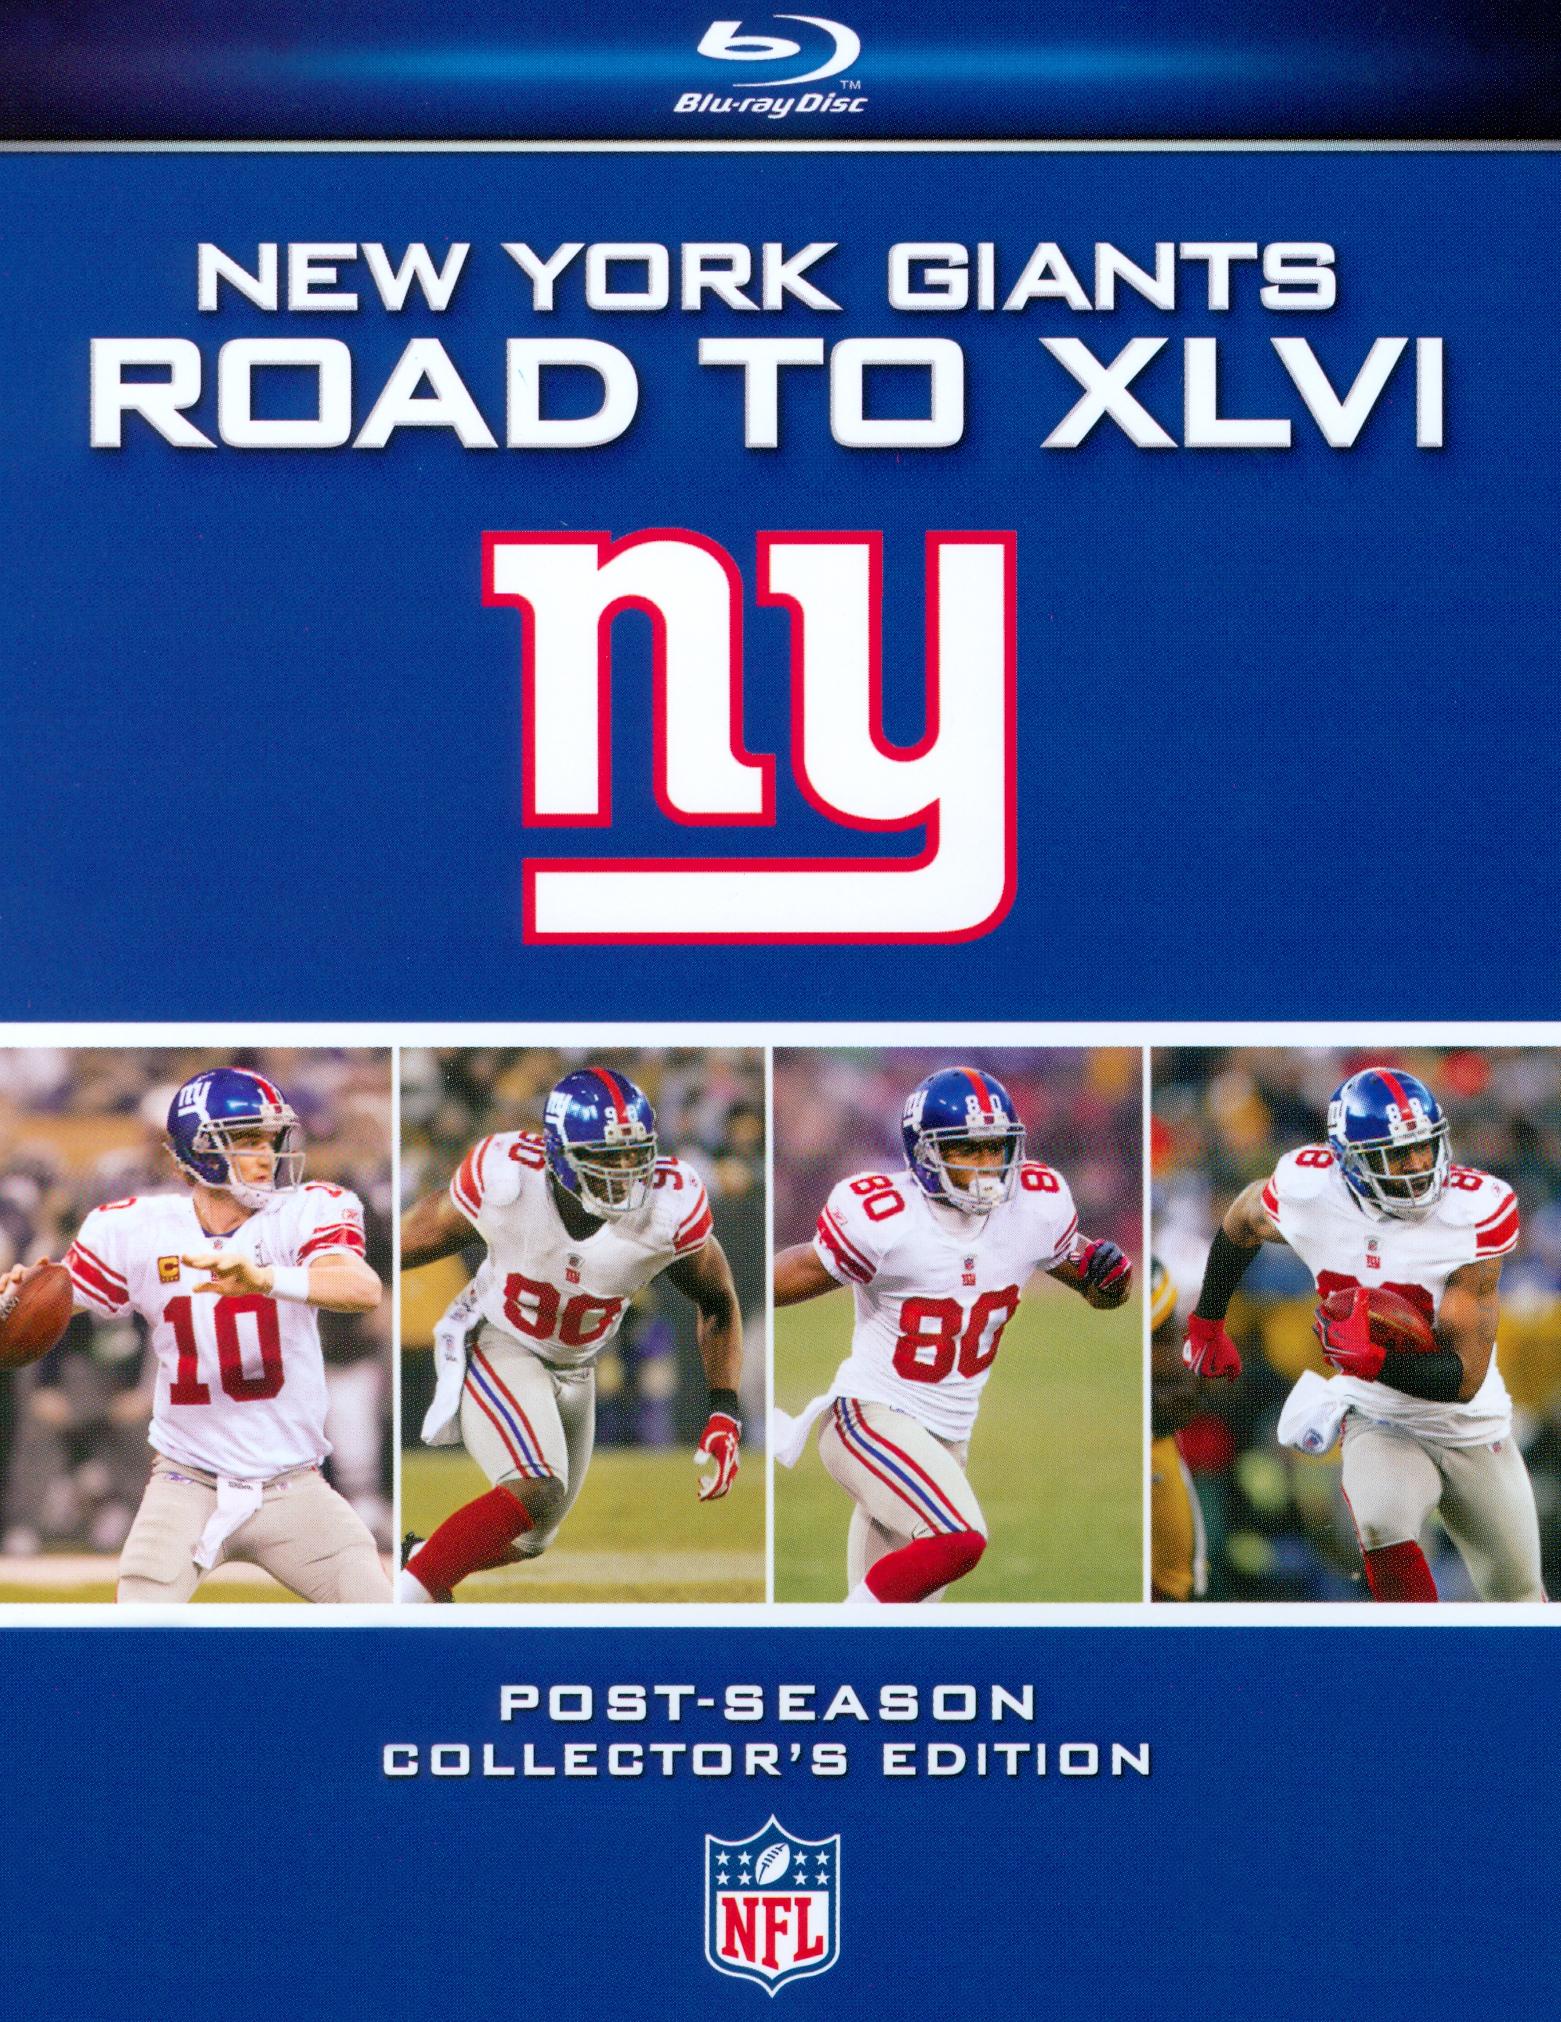 NFL: New York Giants - Road to XLVI